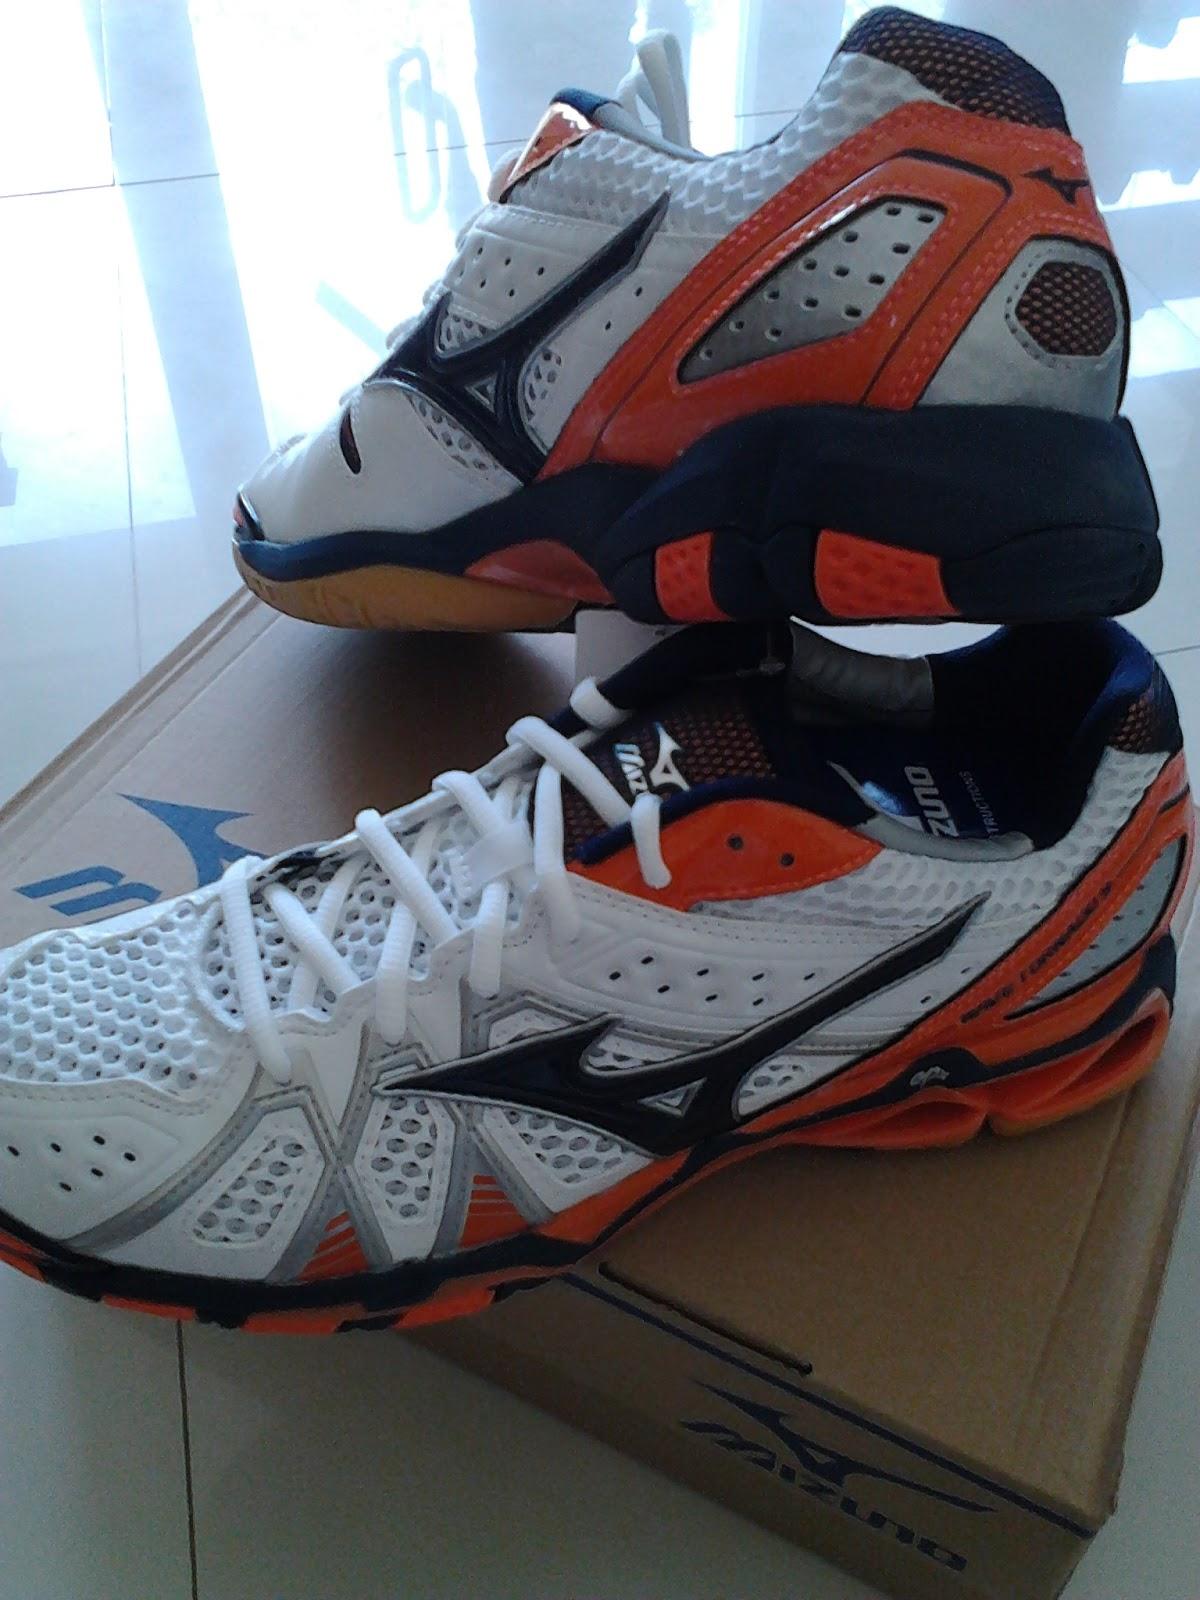 Sepatu Sport Running Mizuno Tr9 Low Blue Daftar Harga Terkini Dan Mijuno  Futsal Mf 4 Terupdate 089a2ccaa8